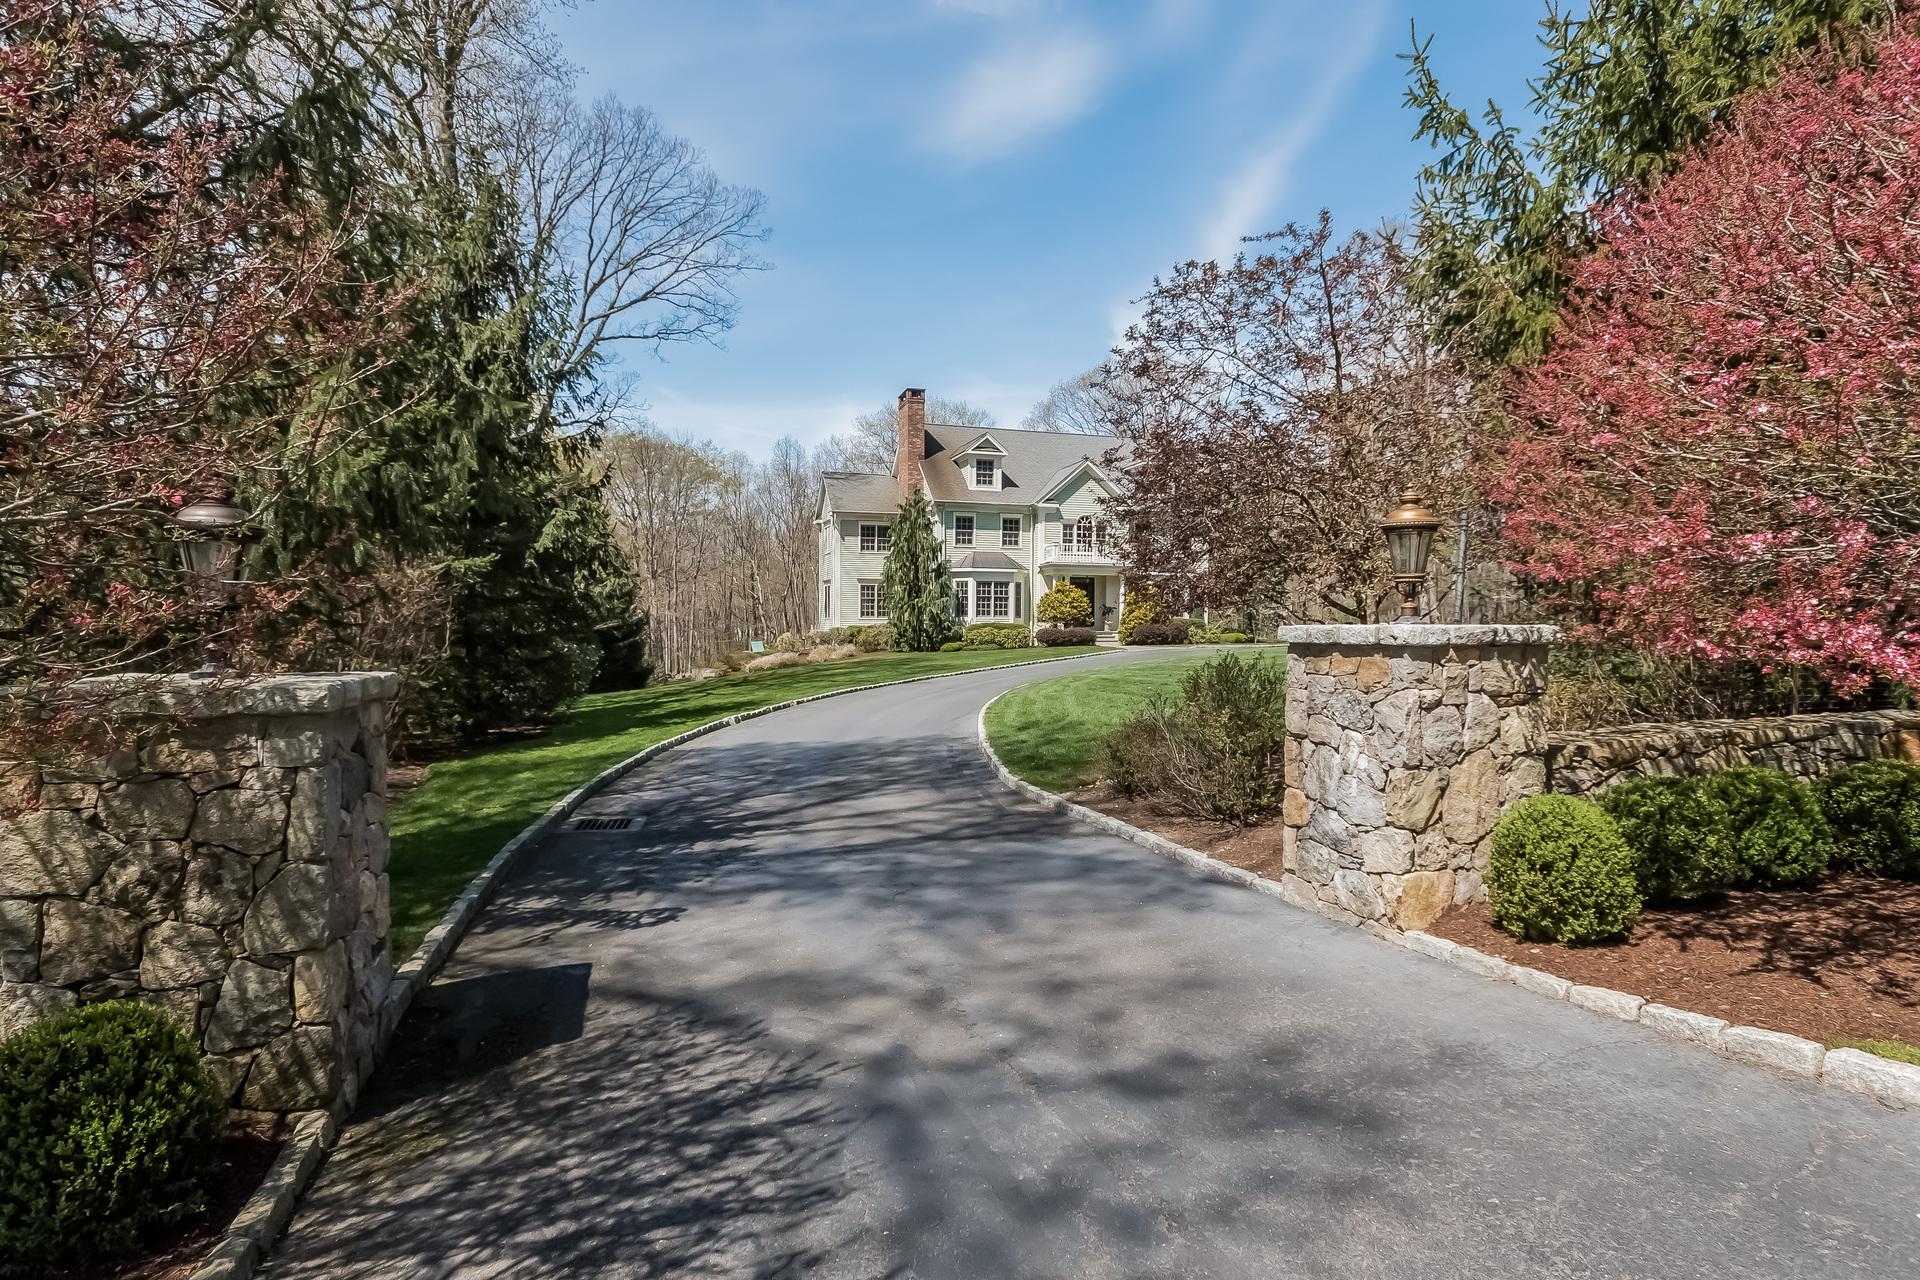 独户住宅 为 销售 在 Exudes Sophistication 149 Linden Tree Road 威尔顿, 康涅狄格州, 06897 美国